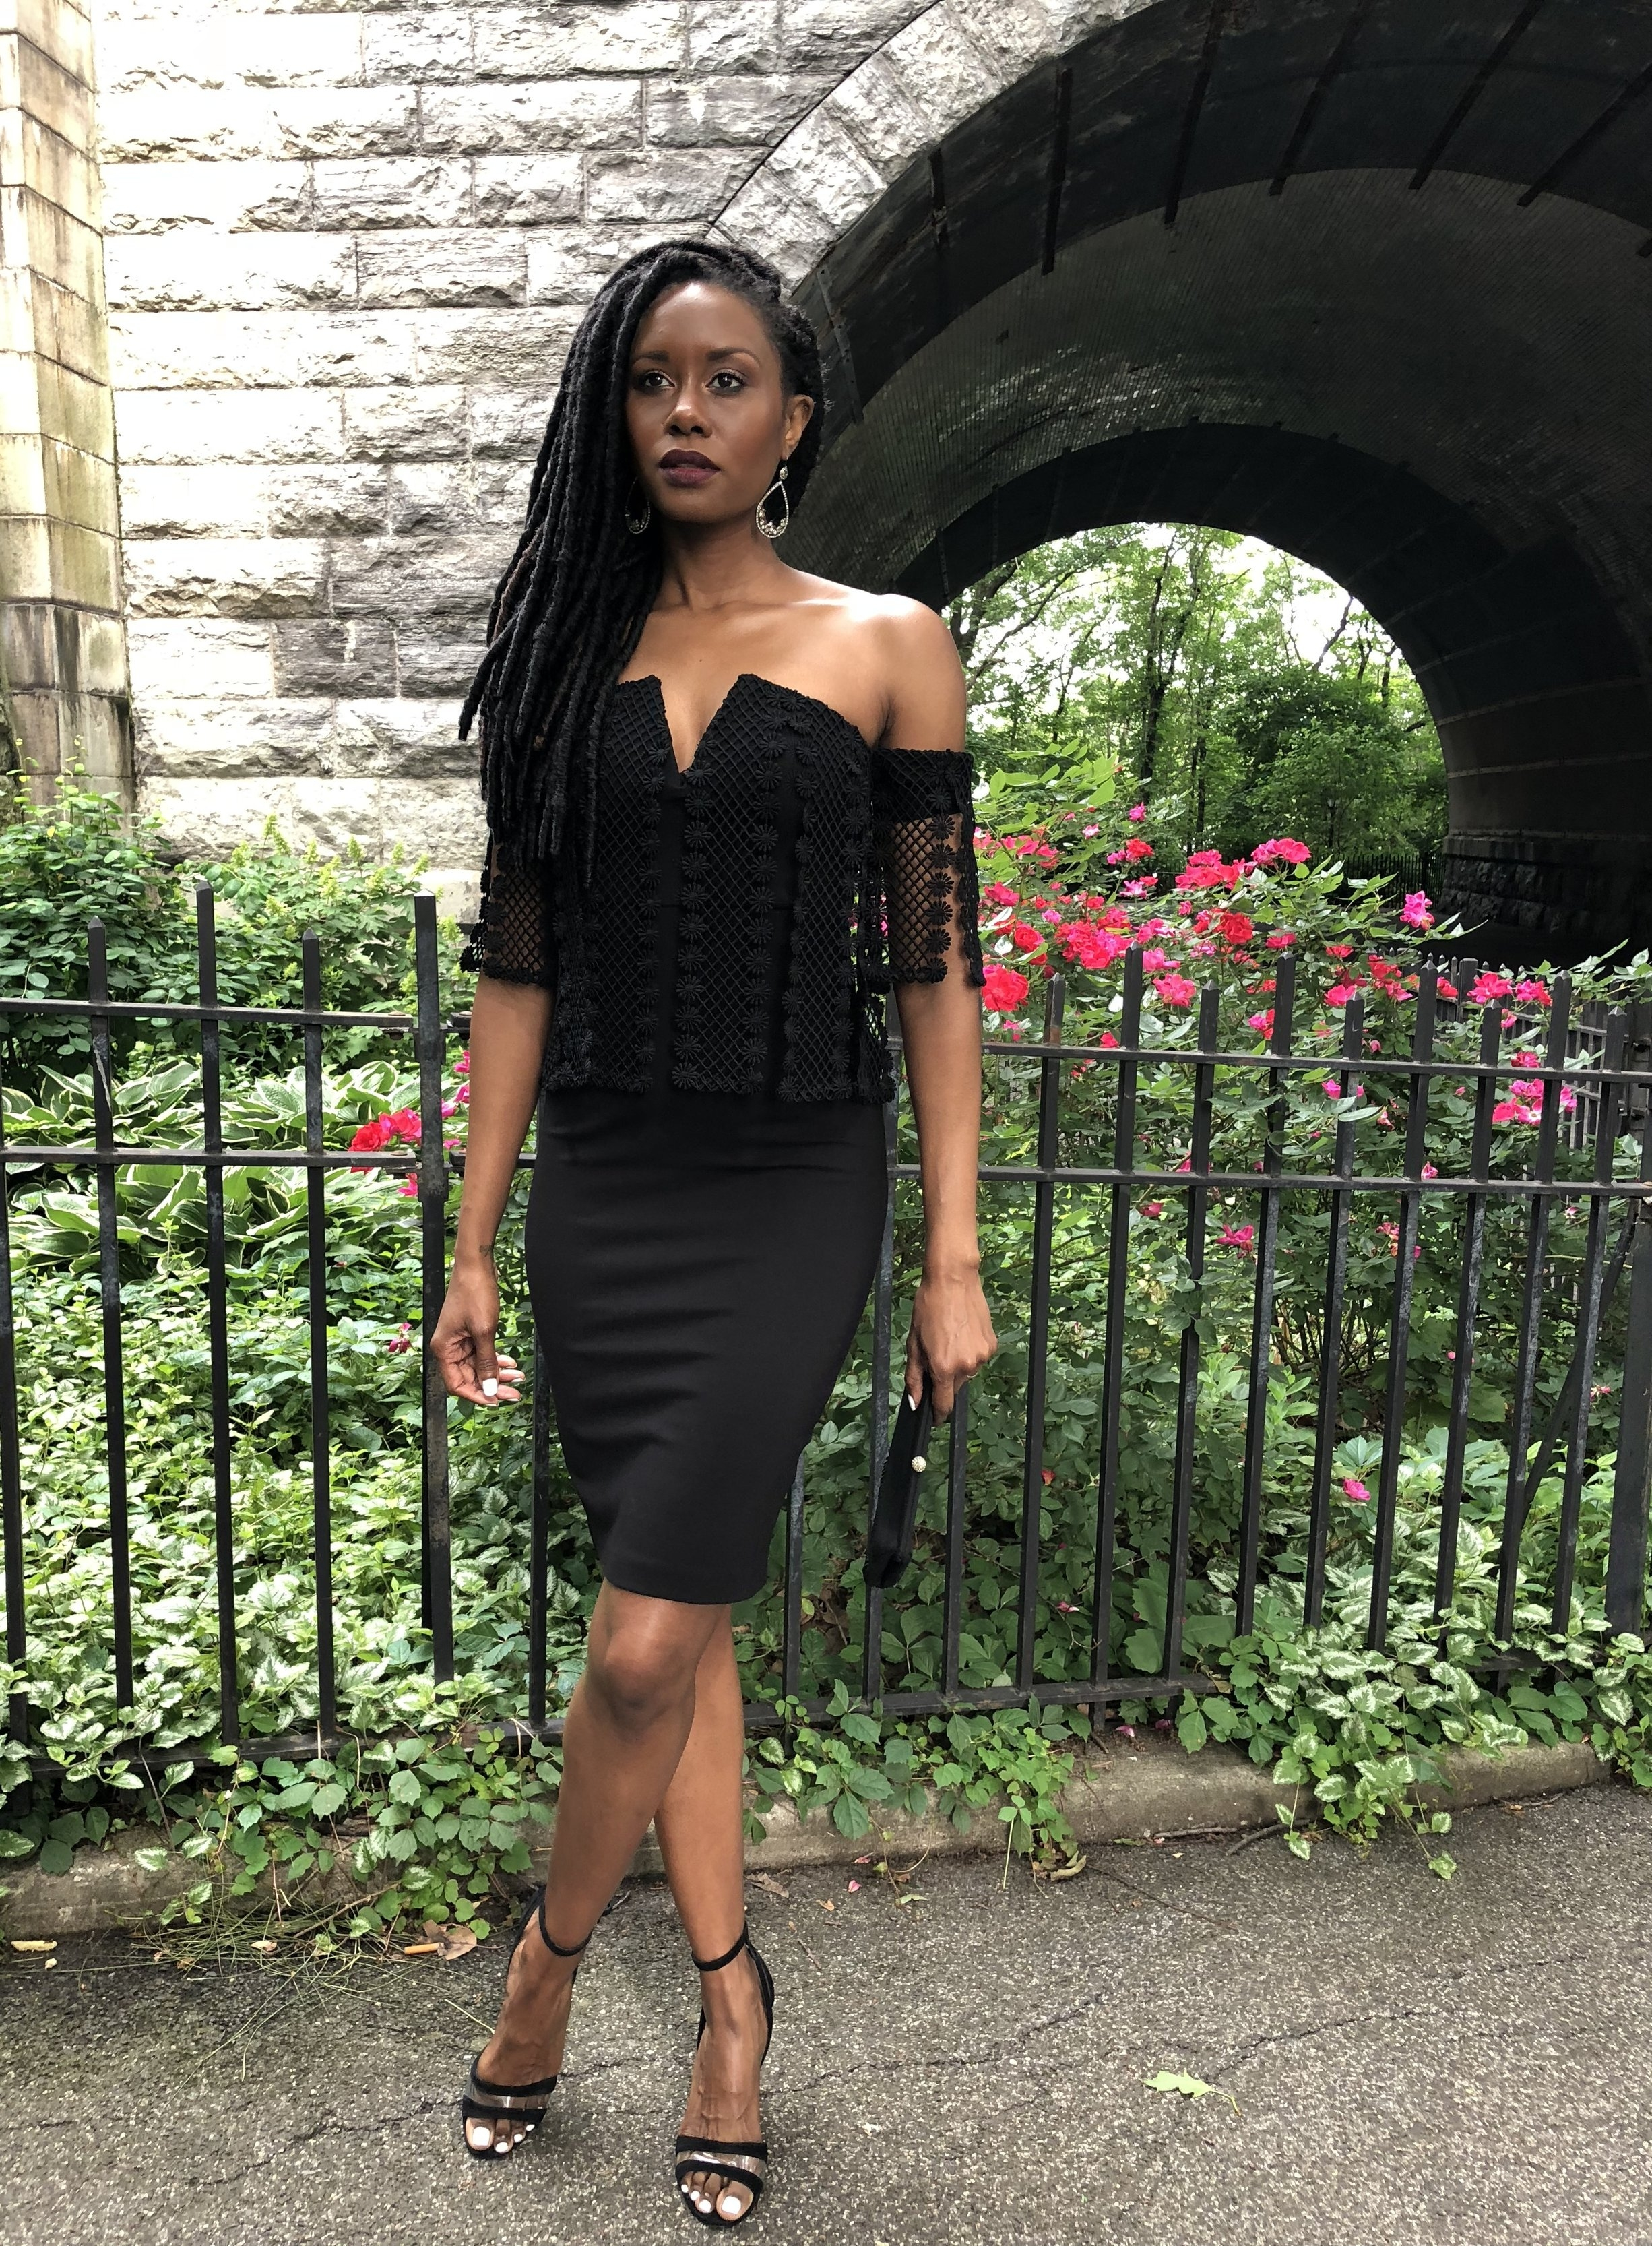 Black Sisley Dress by ELLIAT (www.elliattcollective.com)